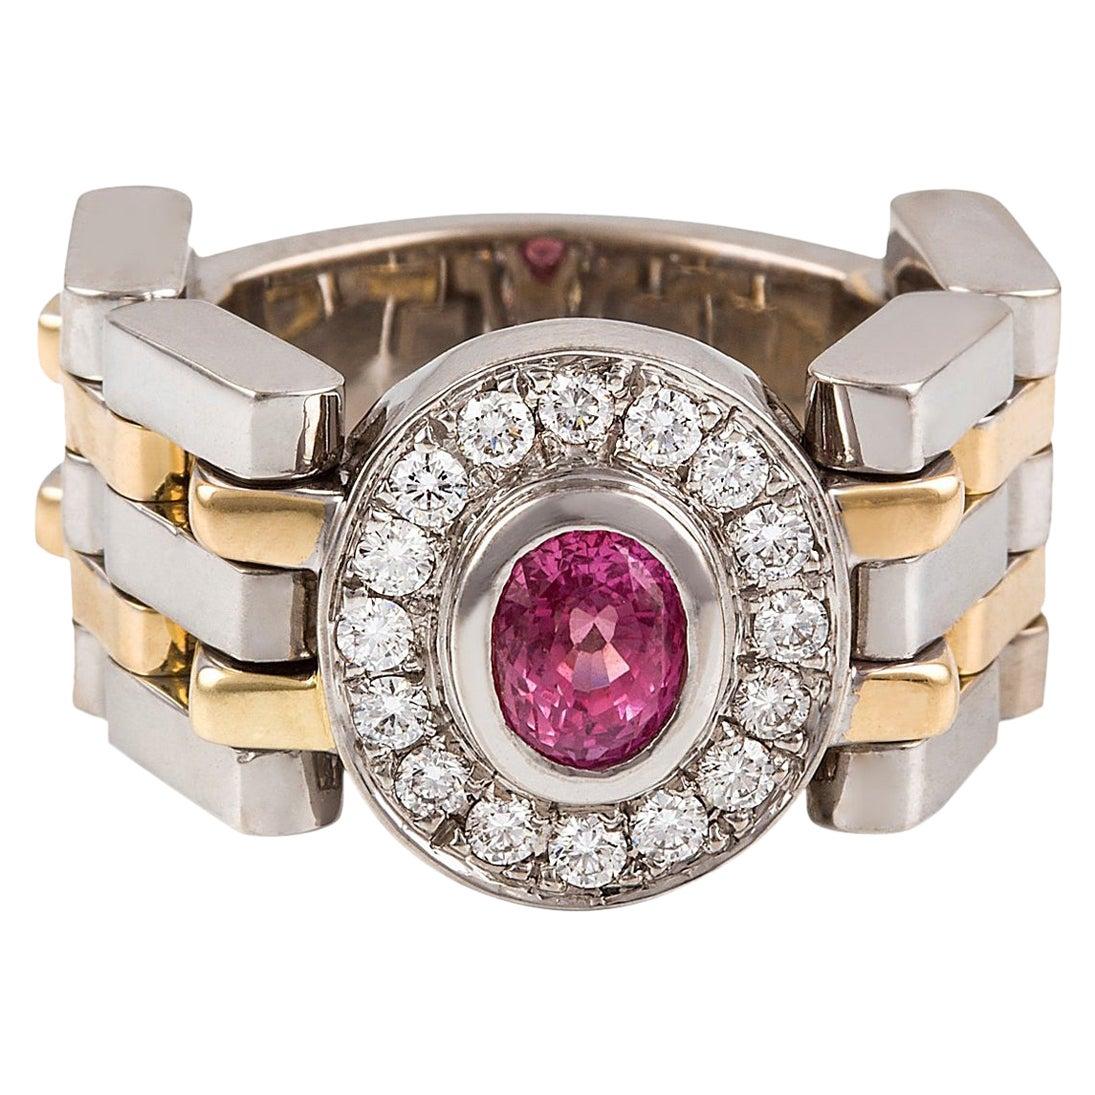 Kian Design Padparadascha Sapphire and Diamond Engagement Ring 18 Carat Gold